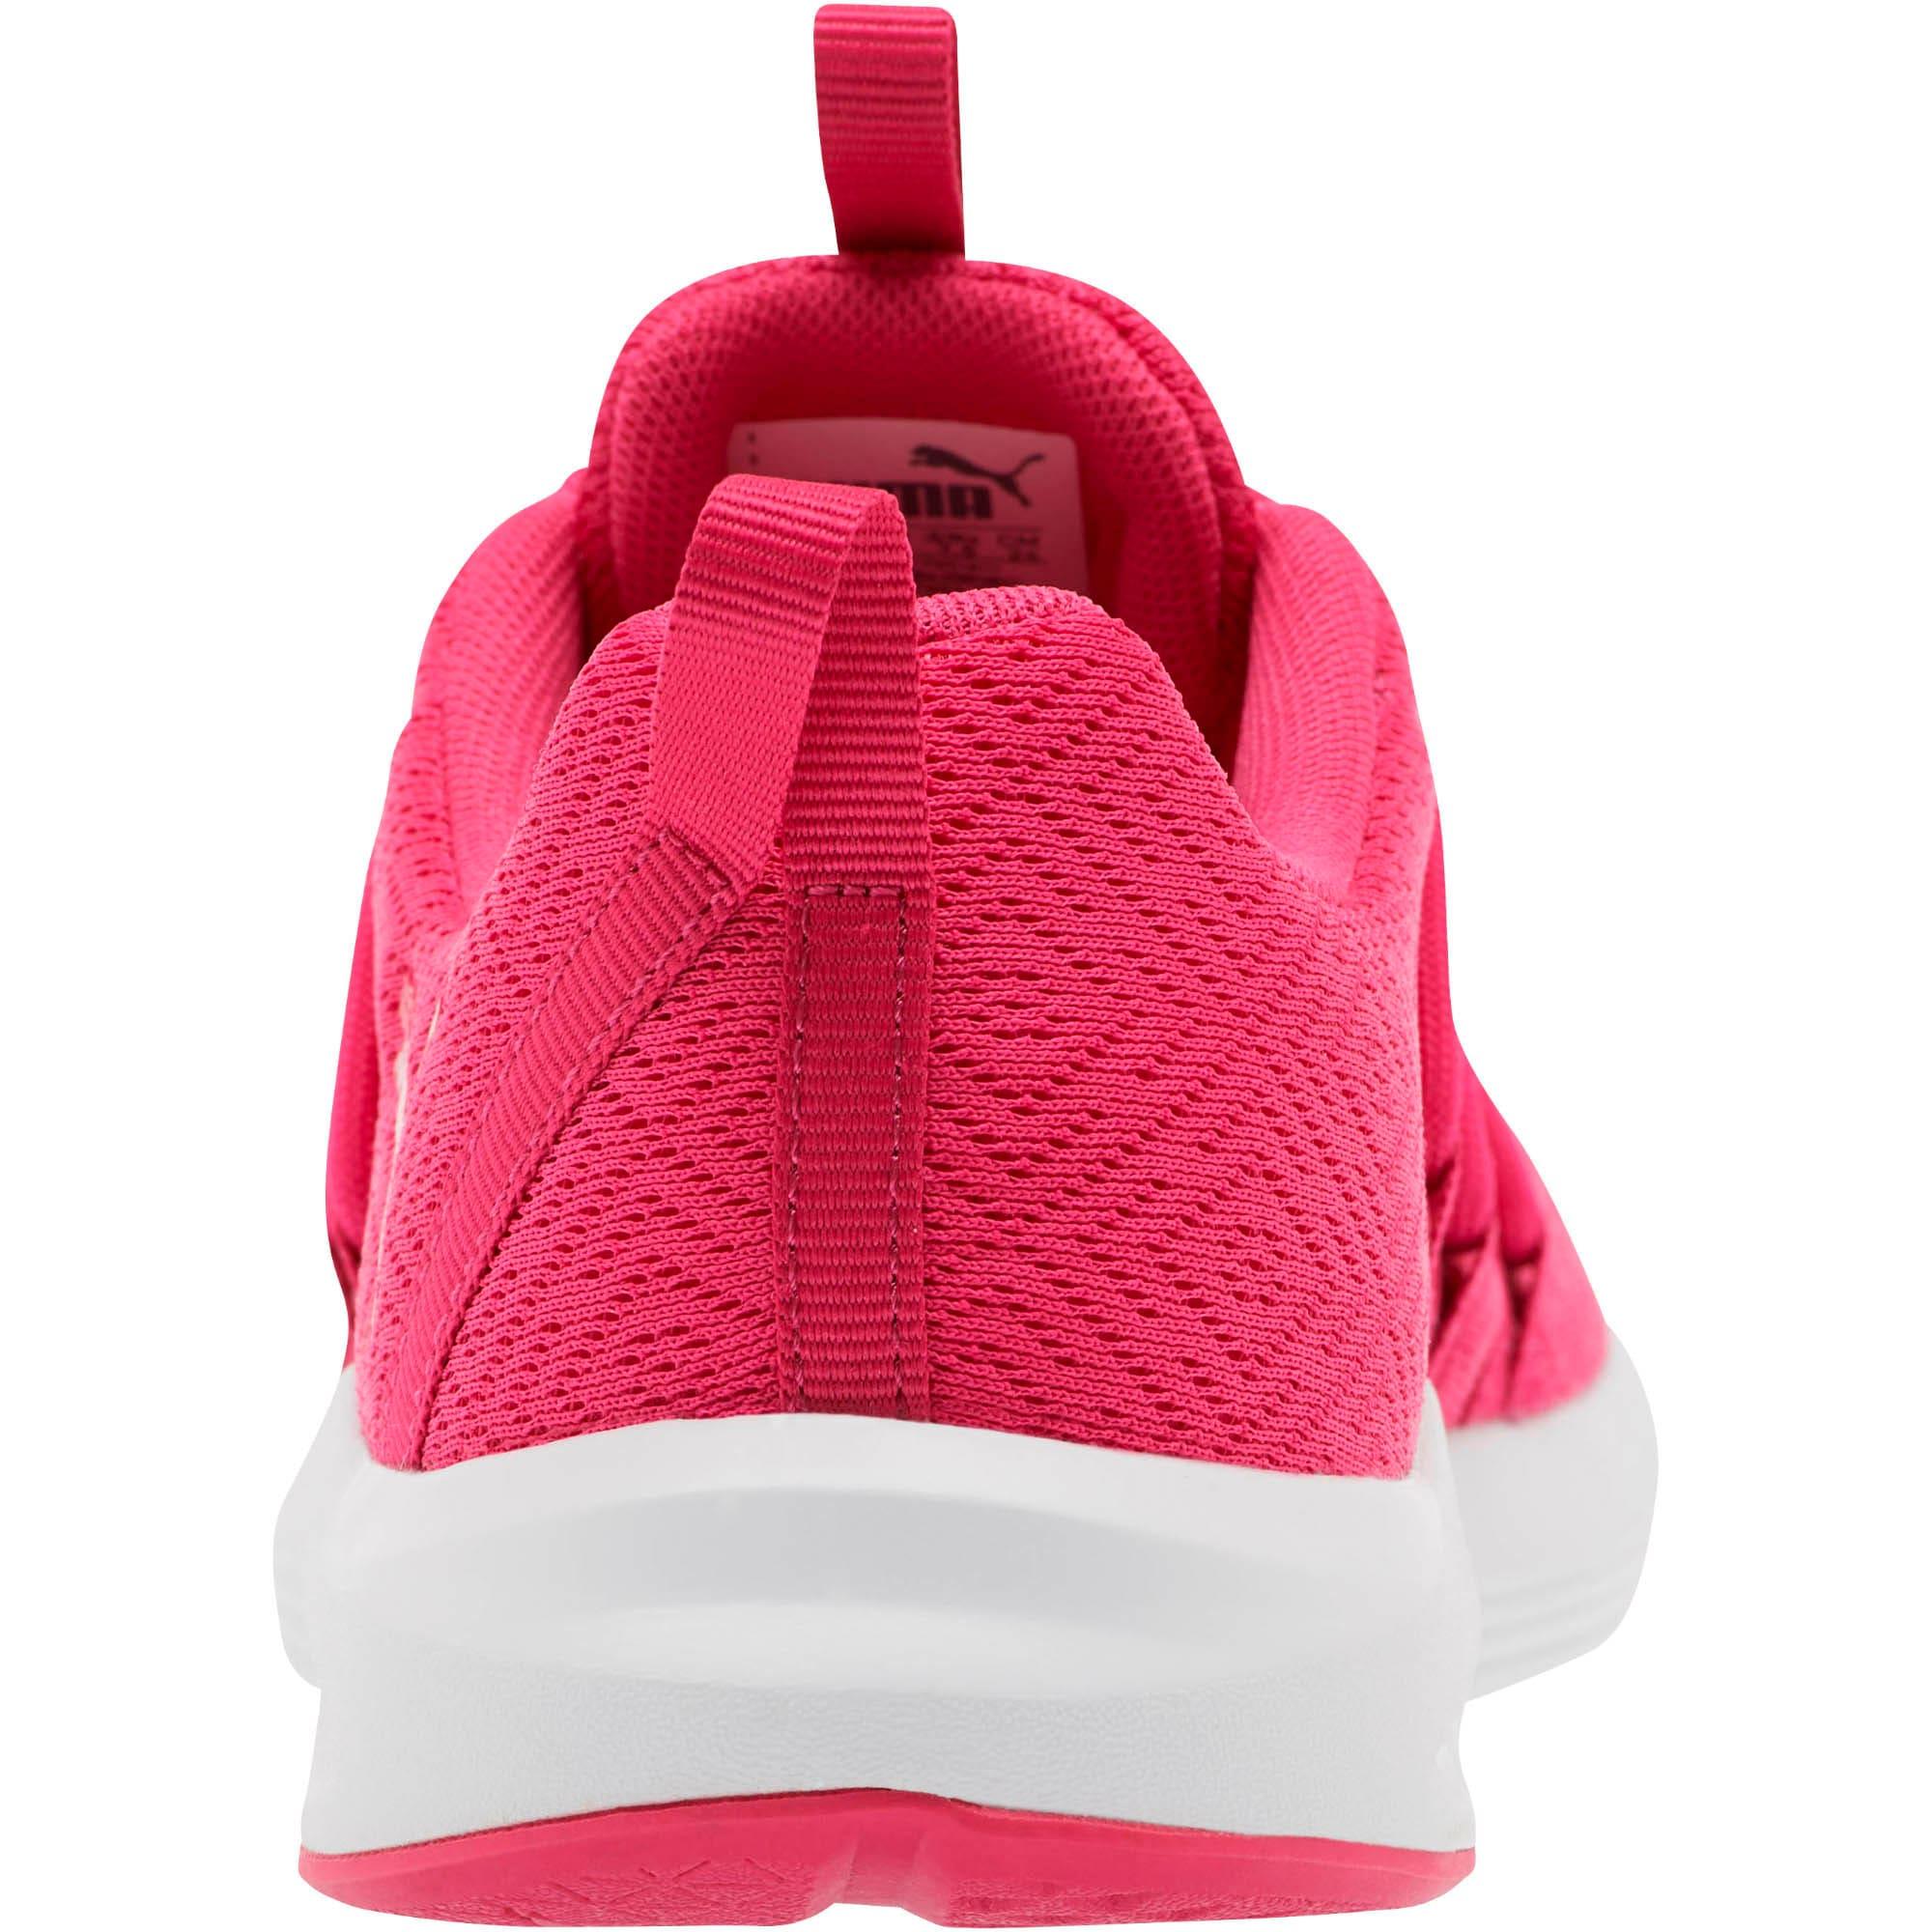 Thumbnail 3 of Prowl Alt Stellar Women's Training Shoes, Fuchsia Purple-Puma White, medium